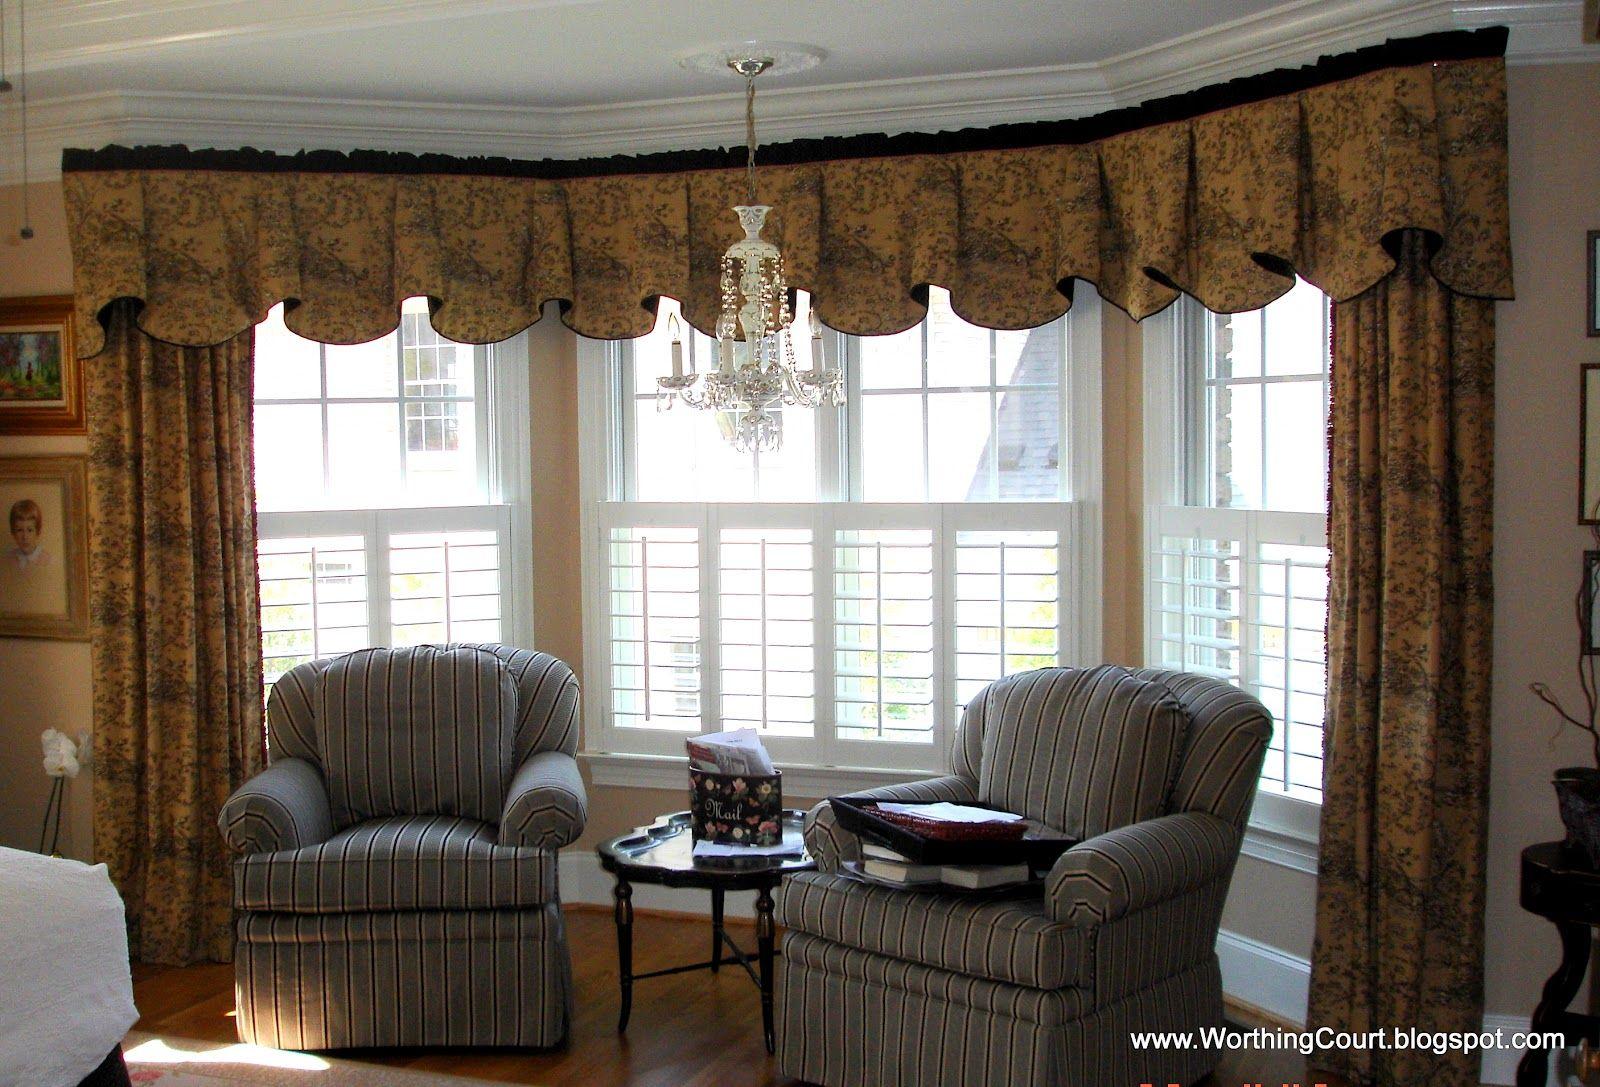 Bay window treatment ideas worthing court bay window - Window coverings ideas living room ...